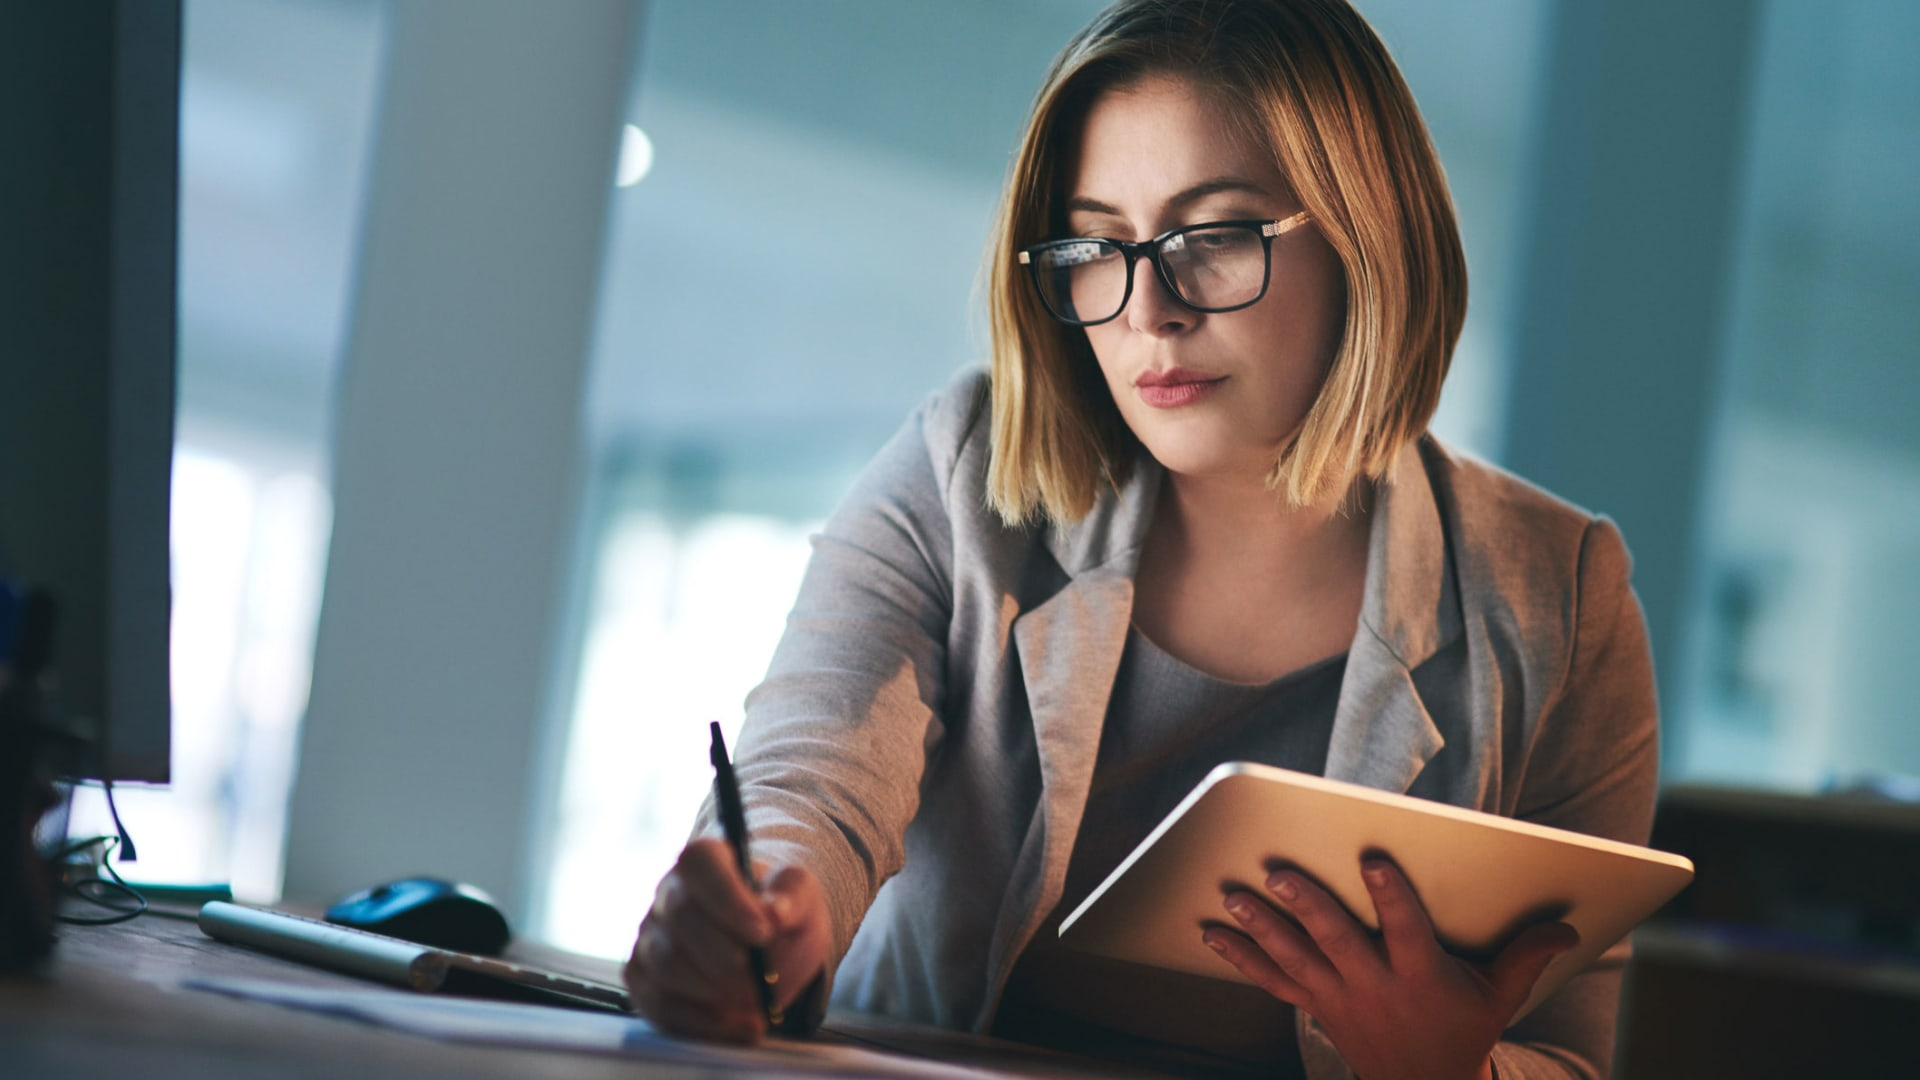 8 Tips to Improve Your Writing as an Entrepreneur